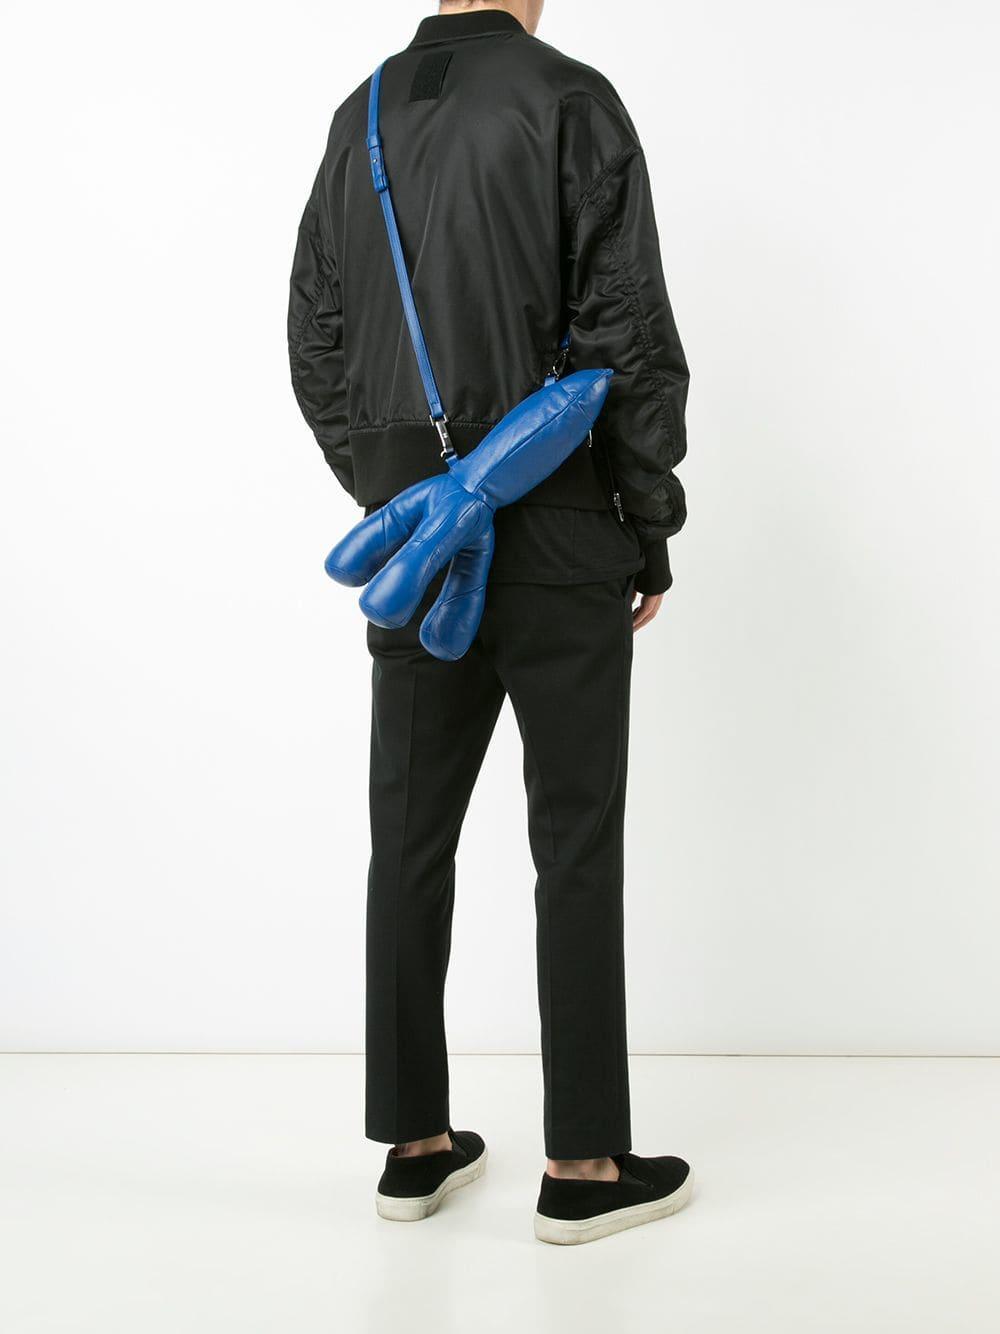 ad394b390dc9 Lyst - Клатч В Форме Ракеты Christopher Raeburn, цвет: Синий